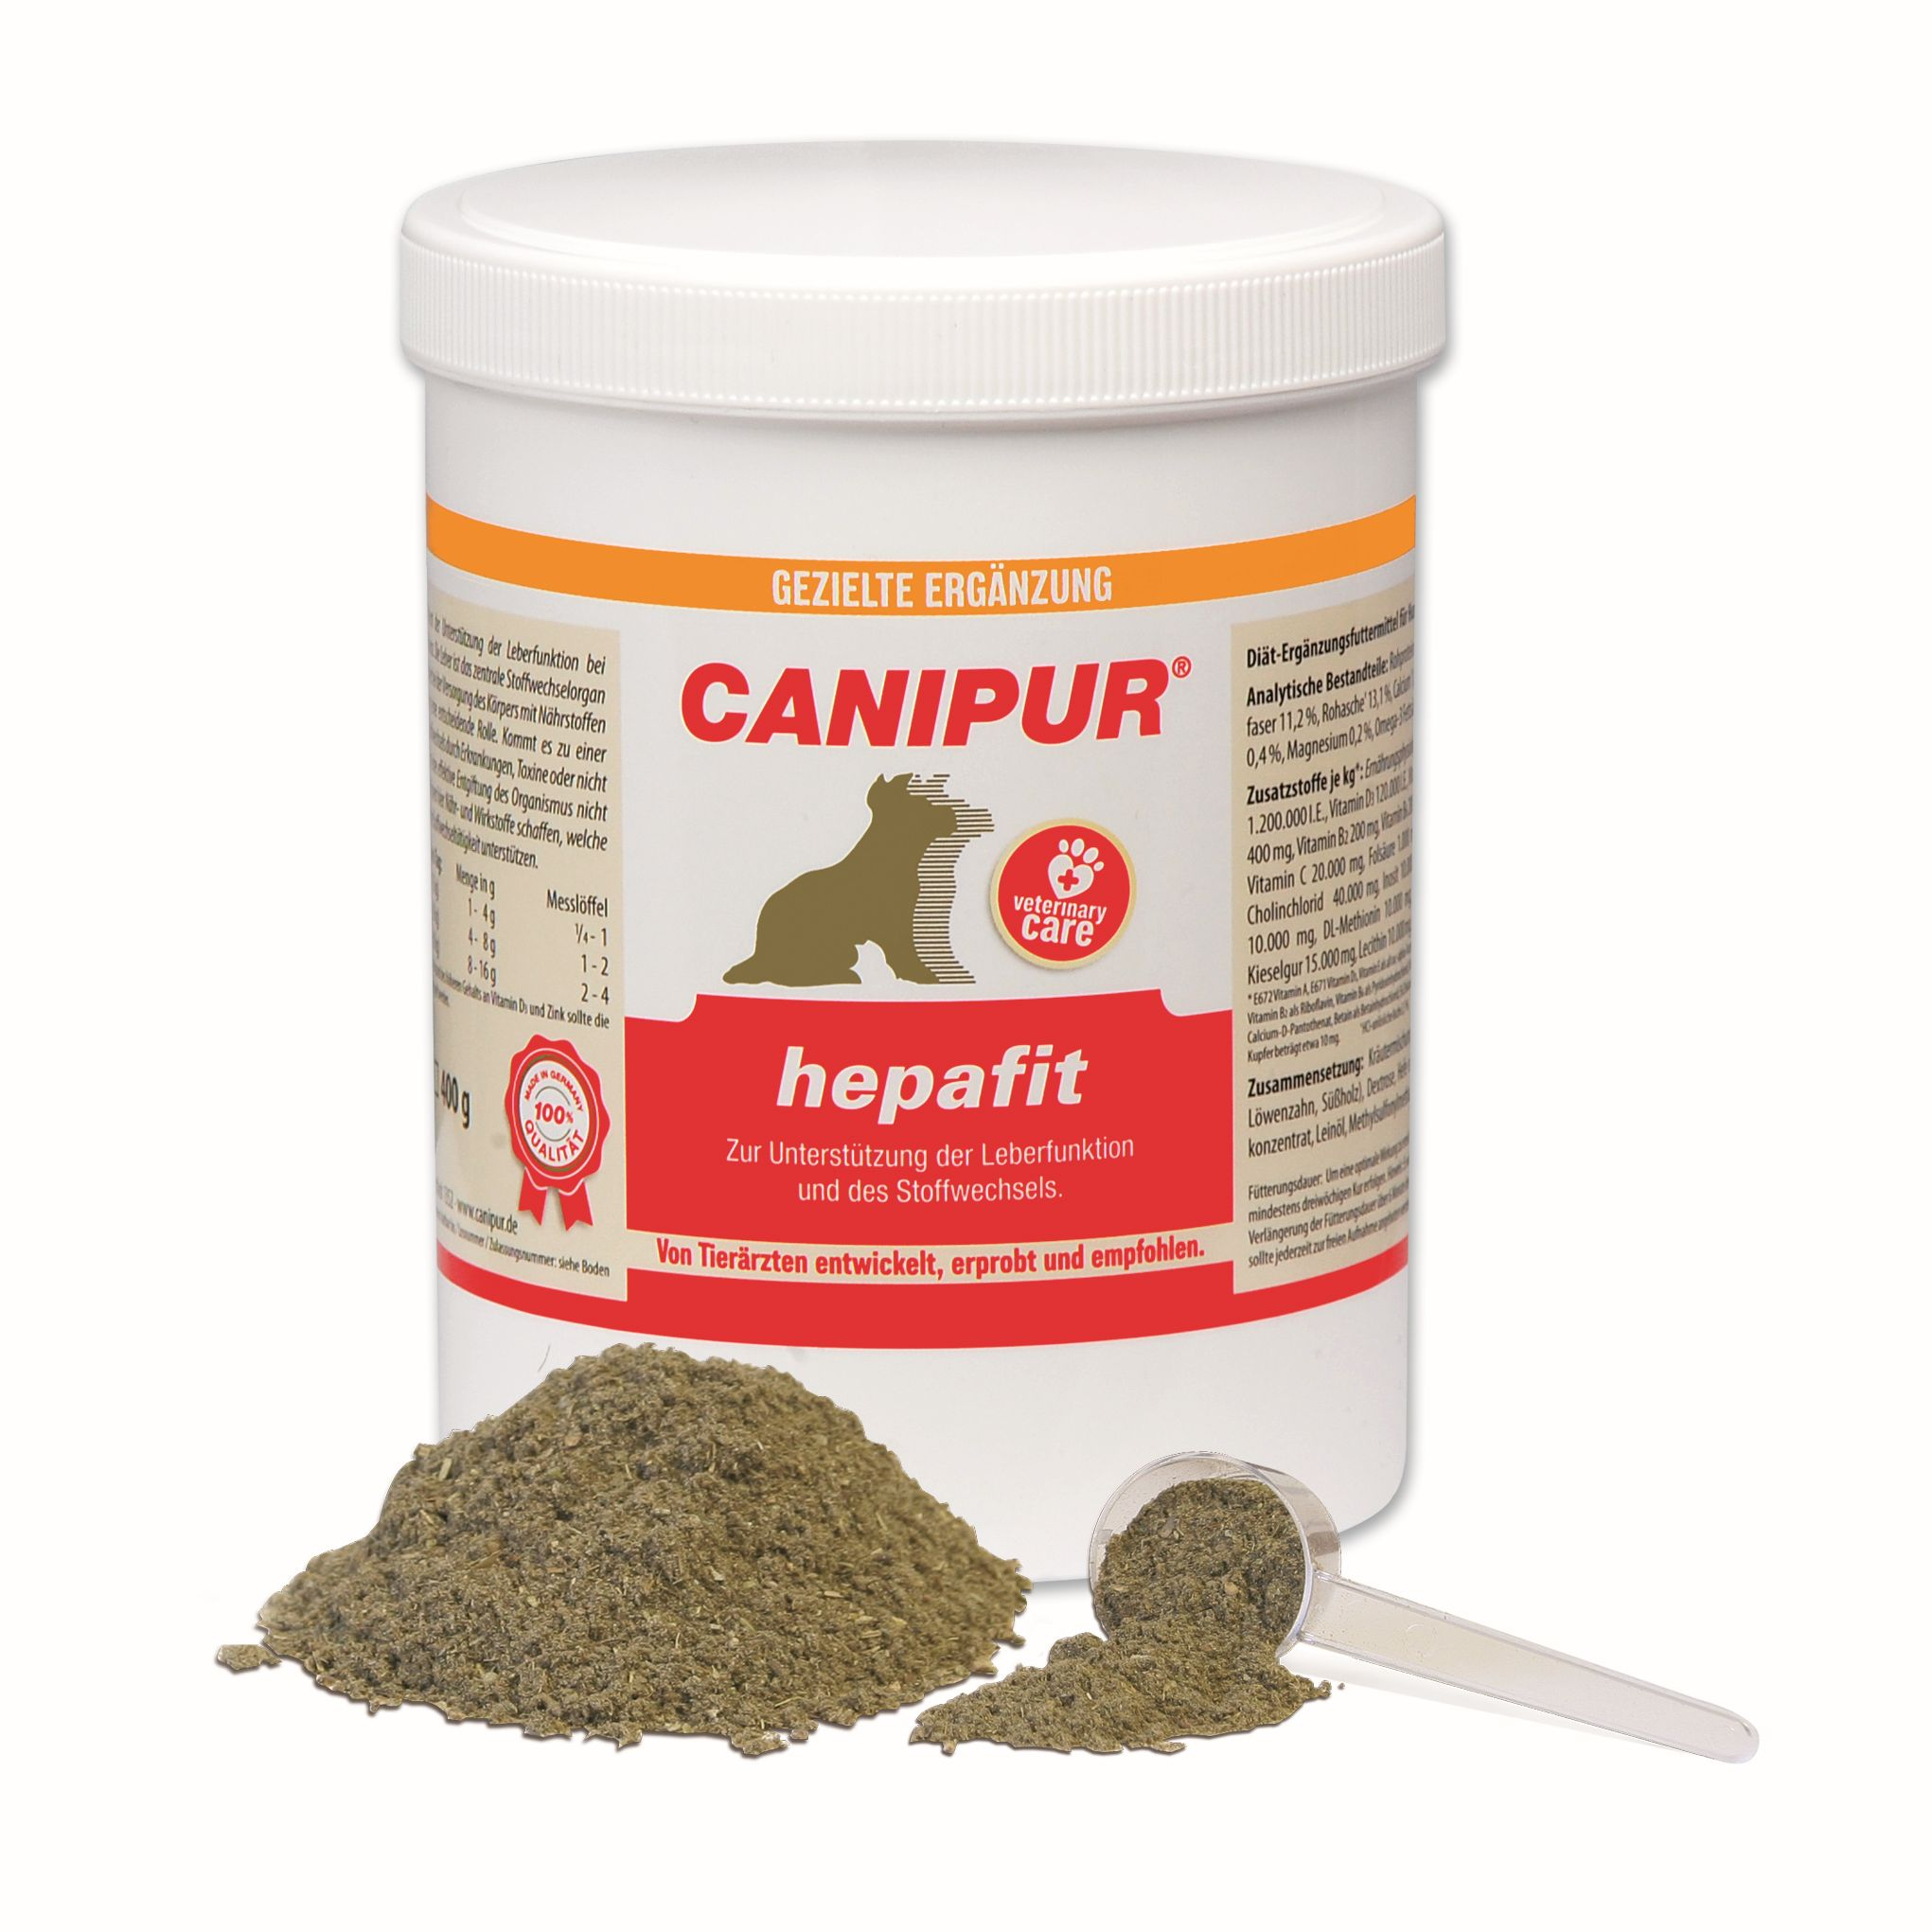 Vetripharm Canipur hepafit